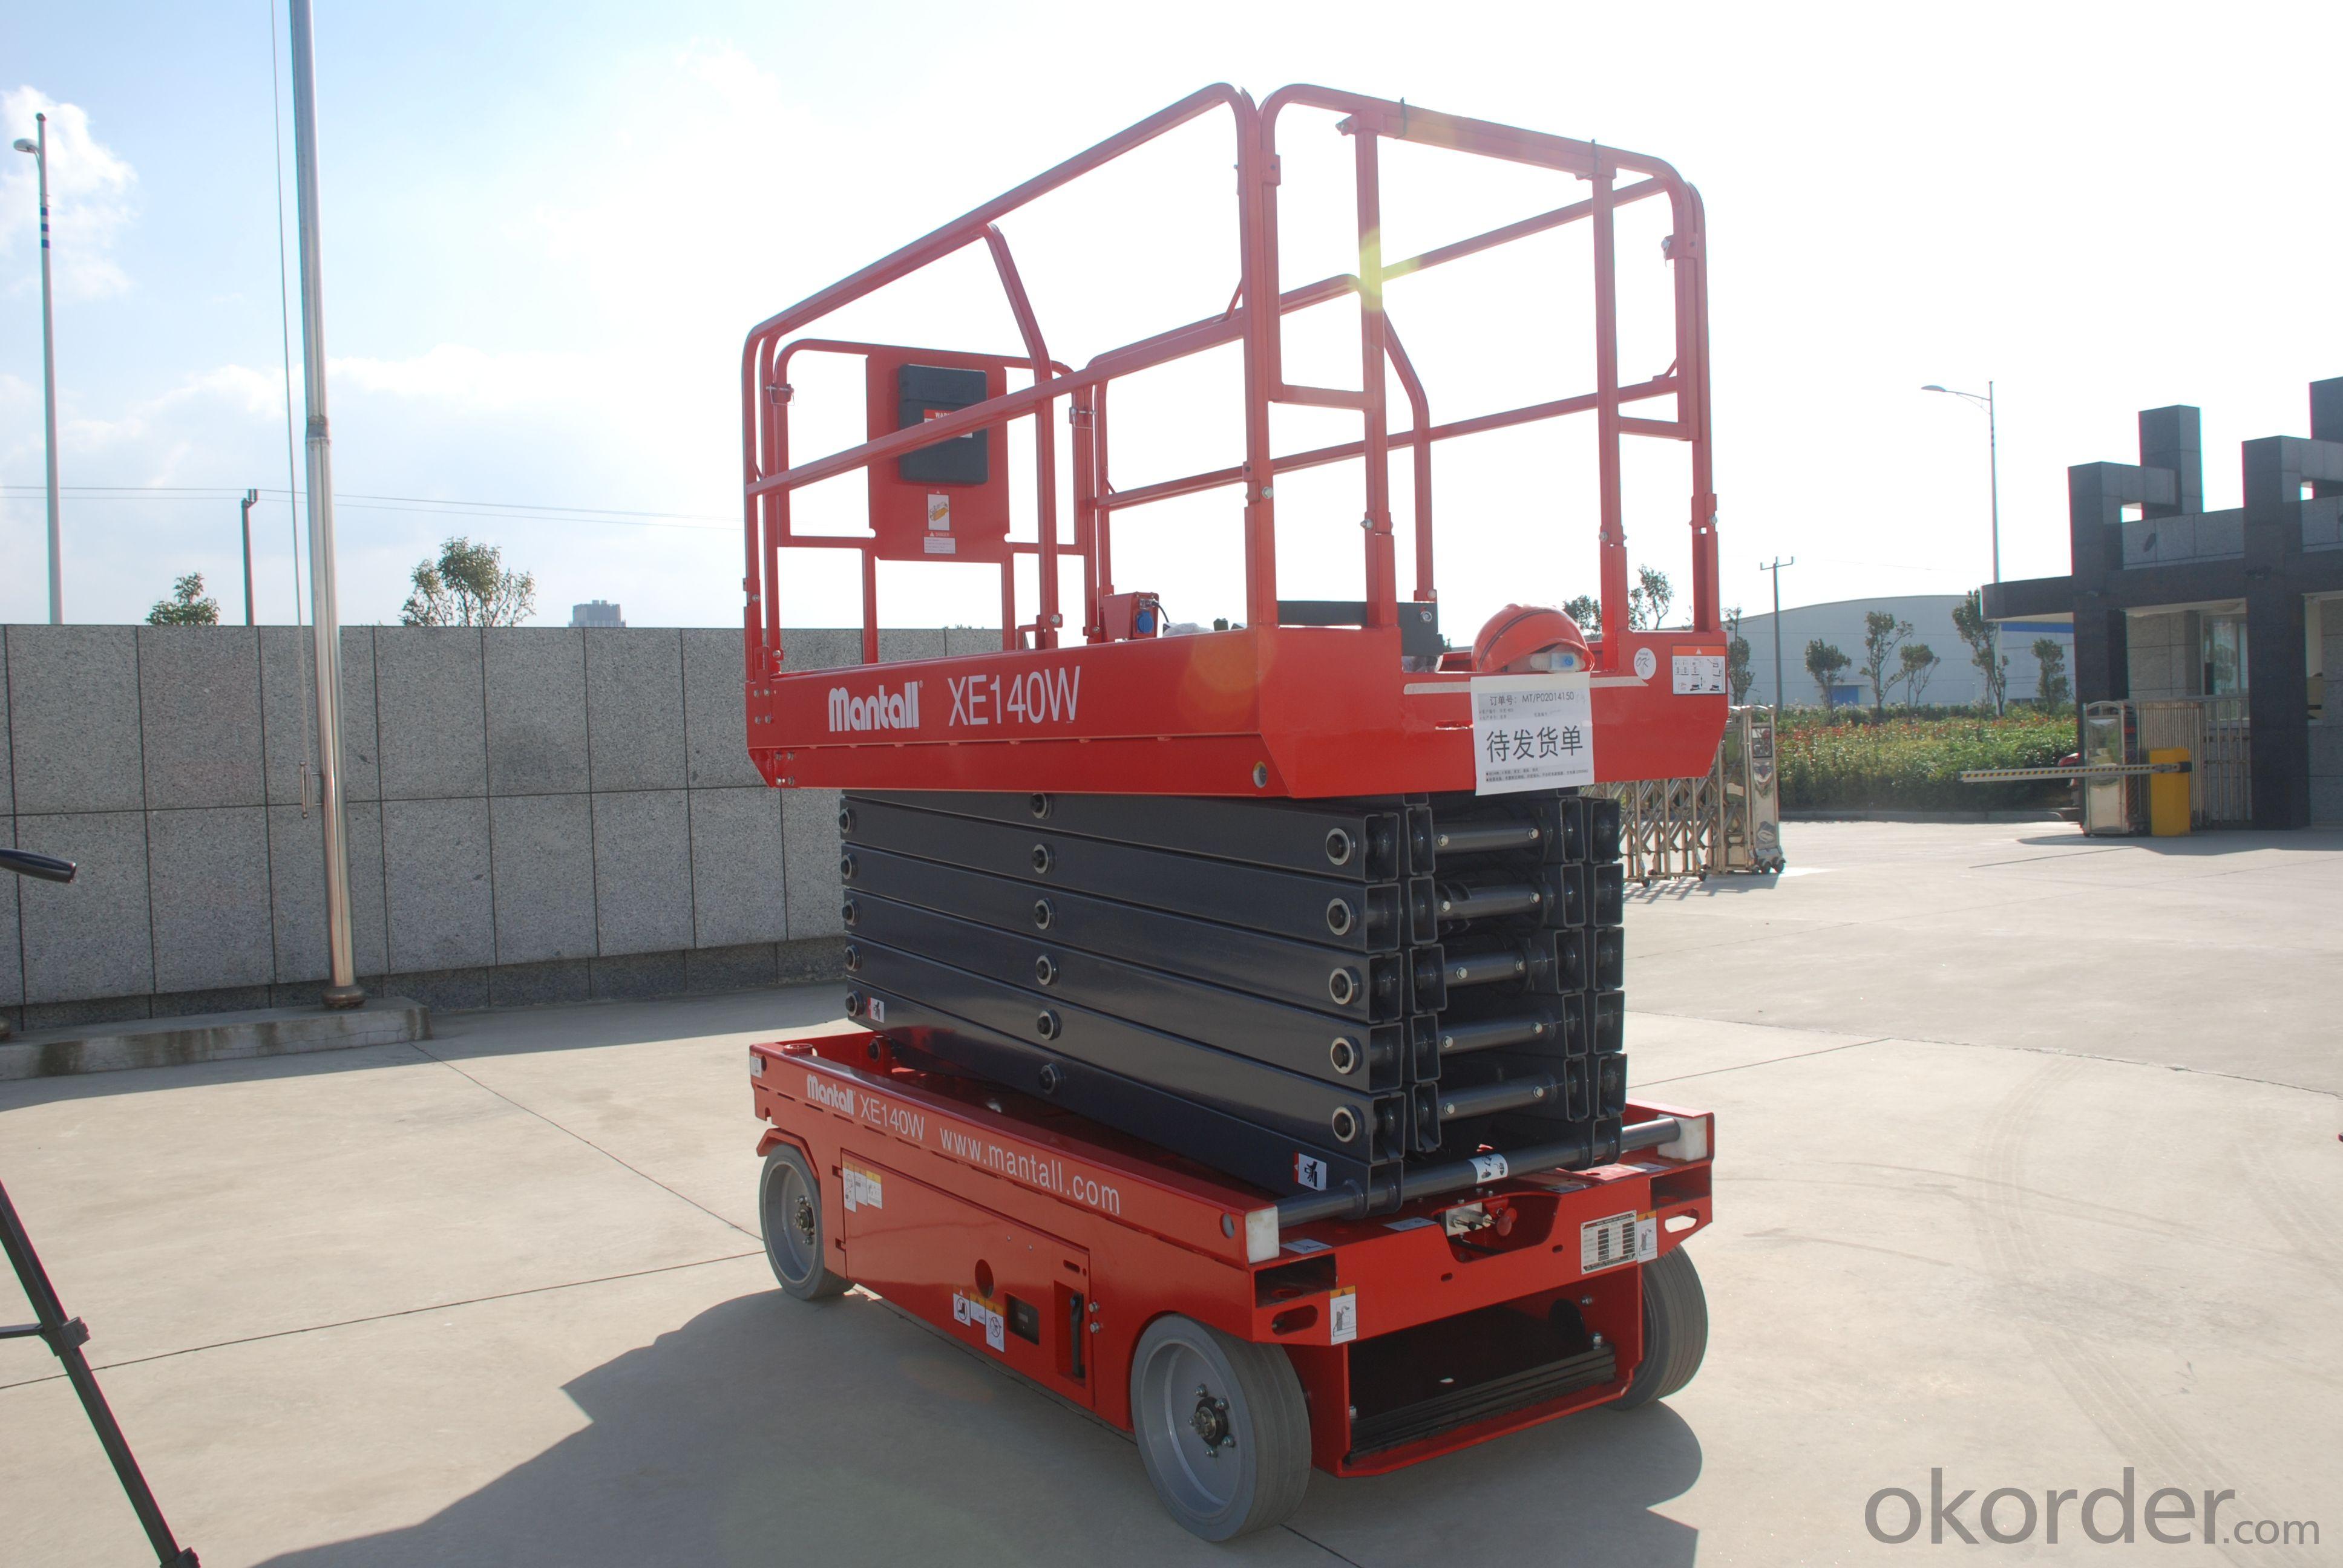 Mantall Aerial Work platform